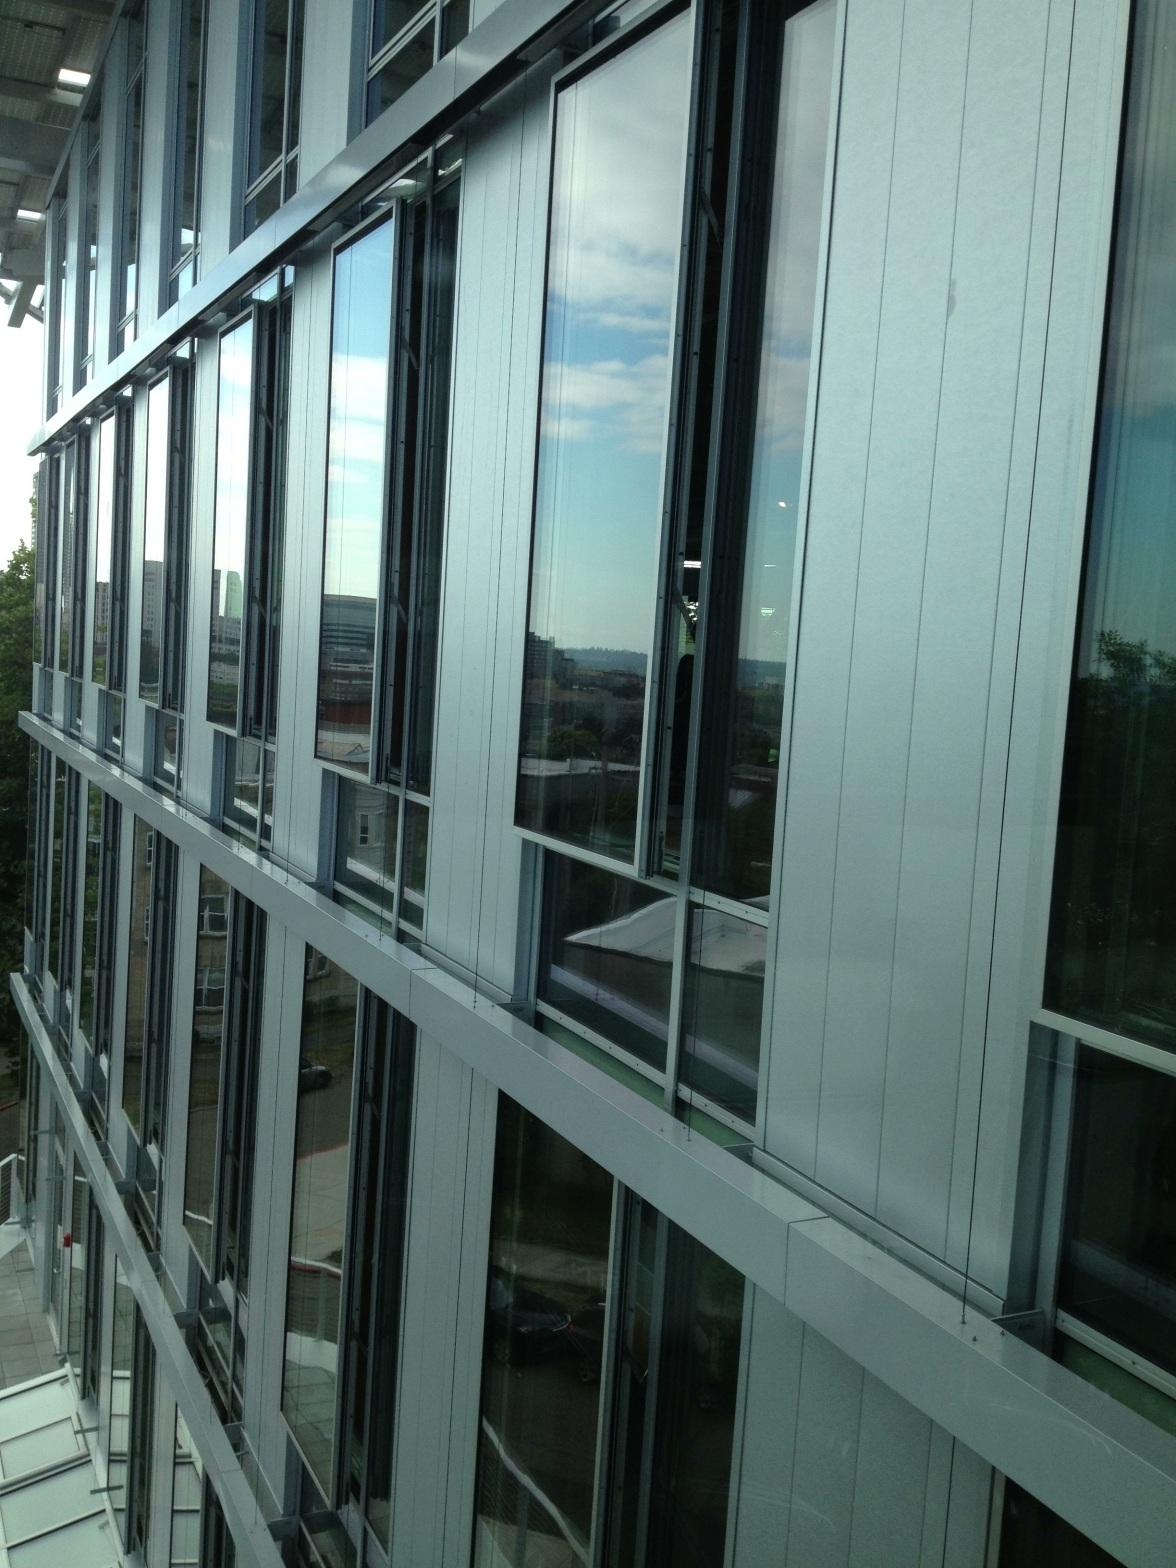 Intentional Future's windows